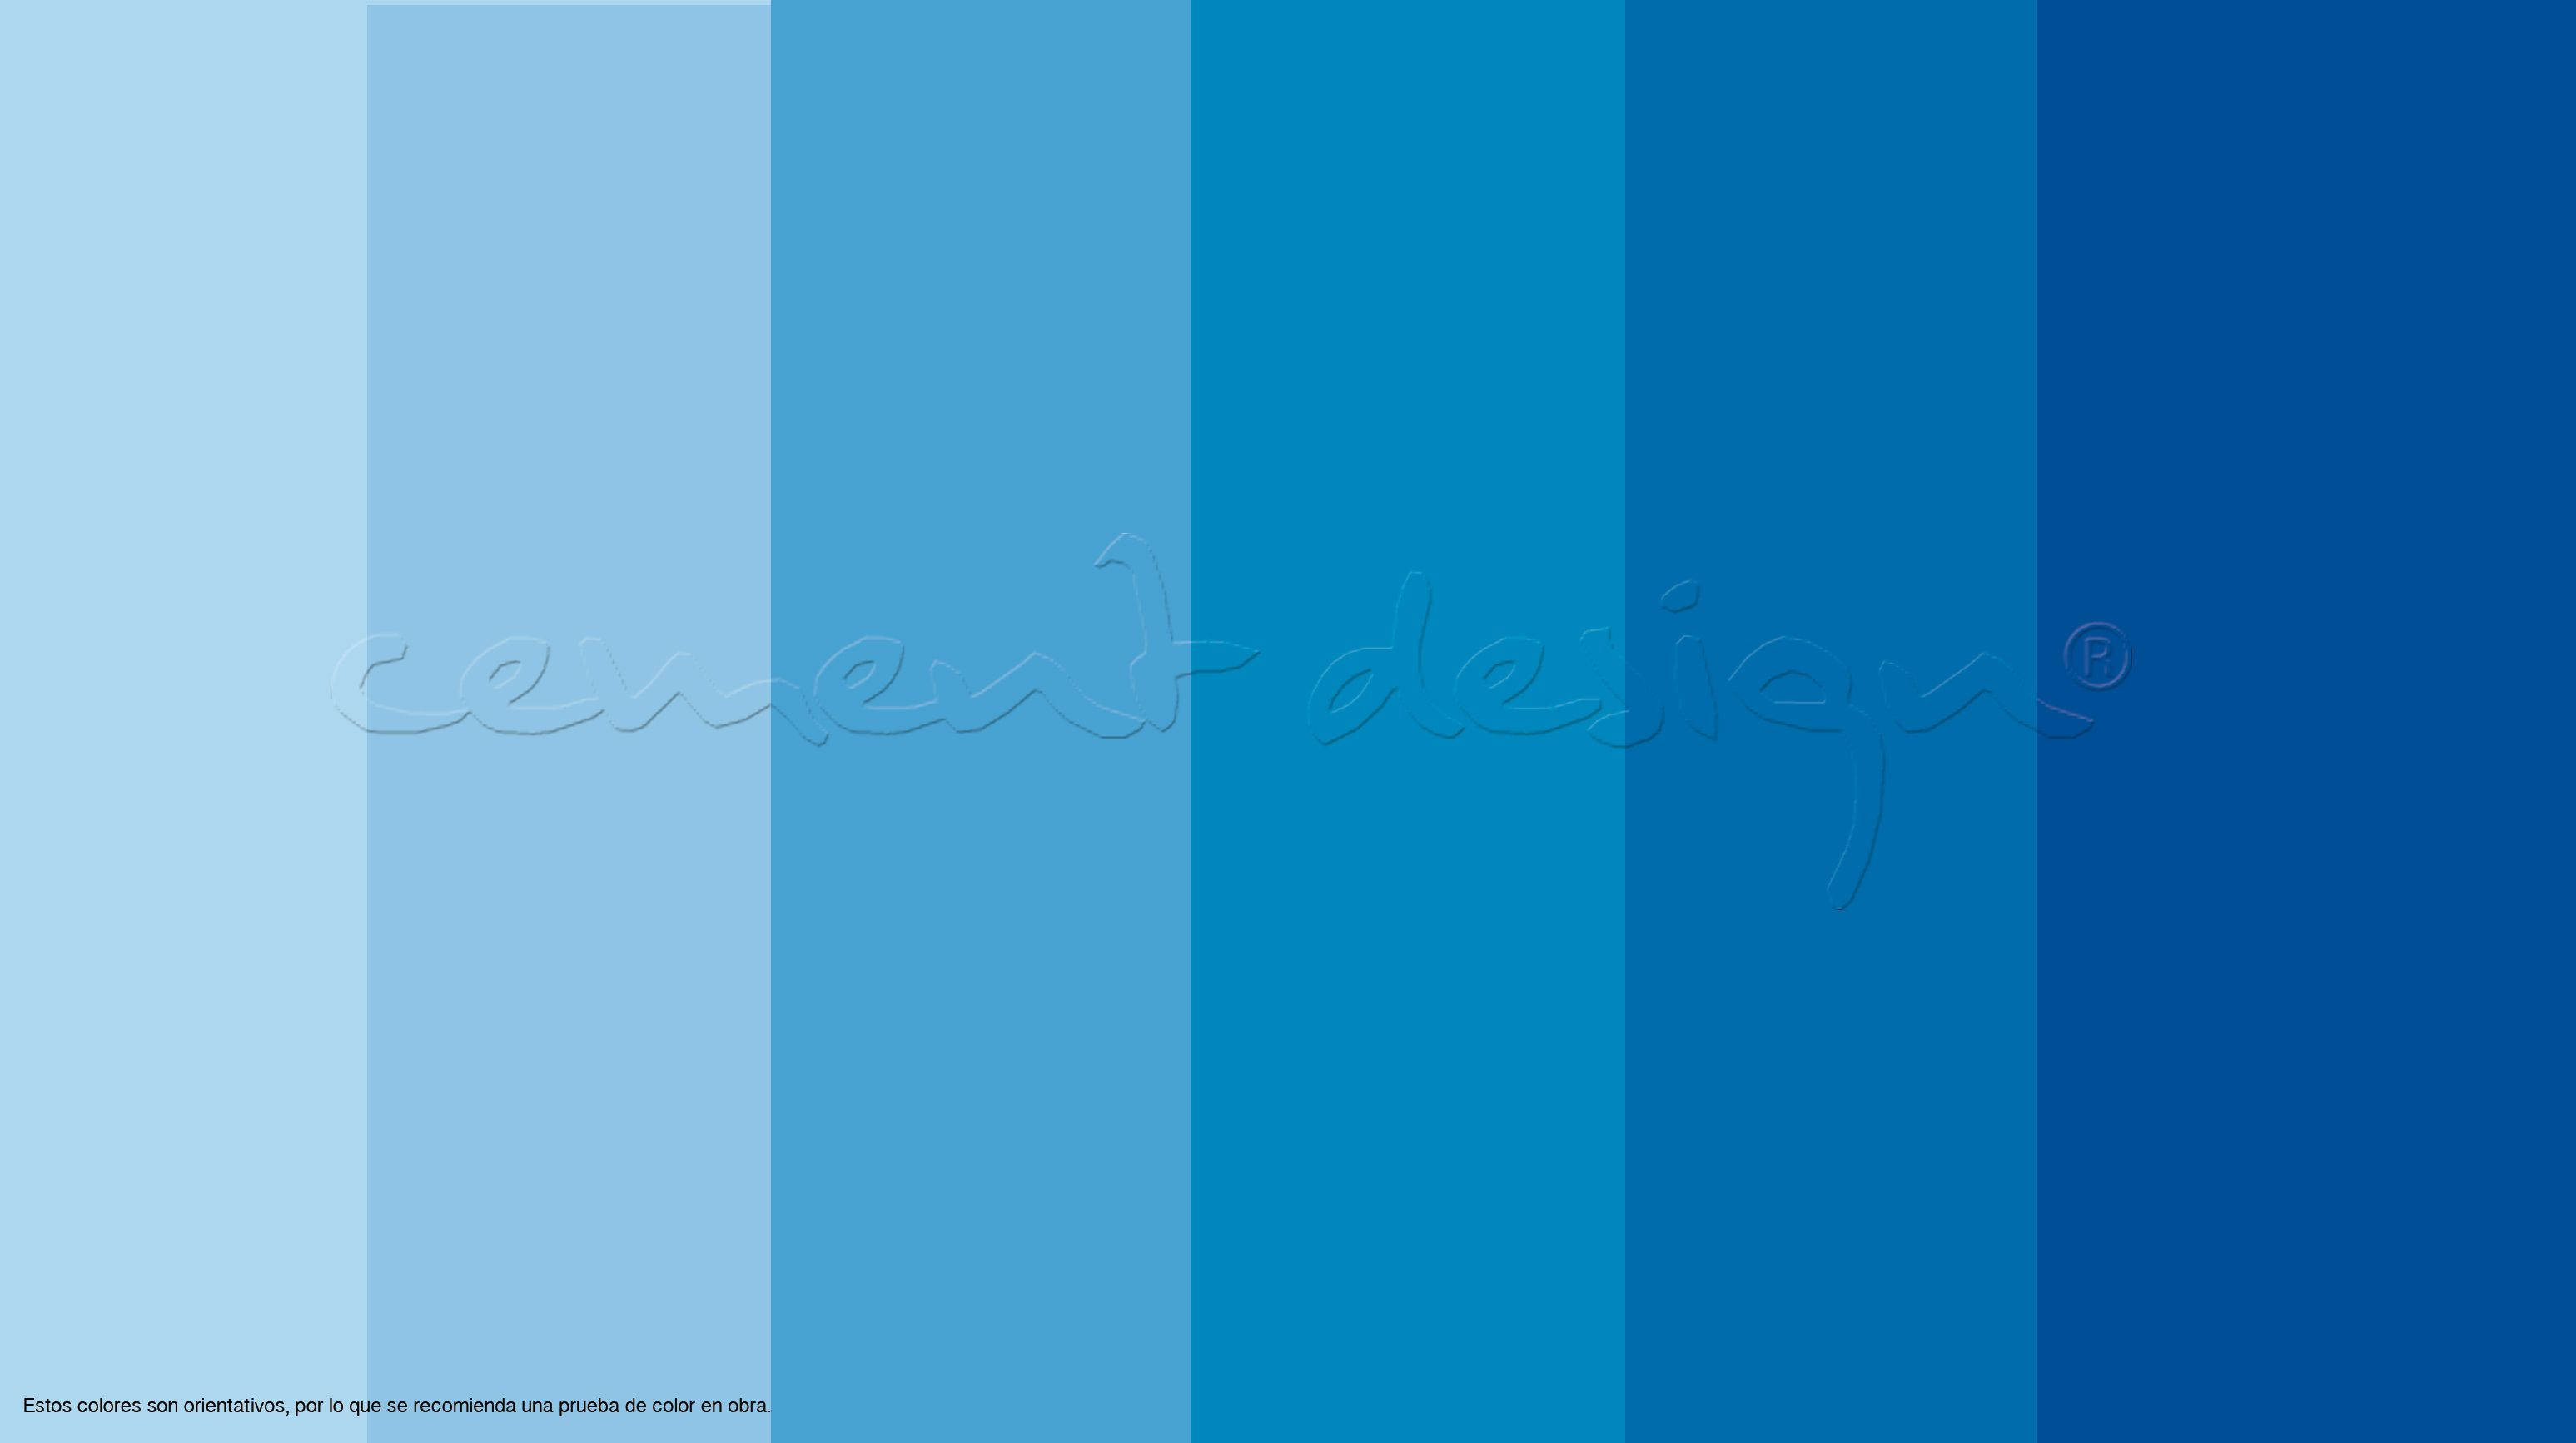 Azul roto / Blended blue, Azul suave / Light blue, Azul dulce ...